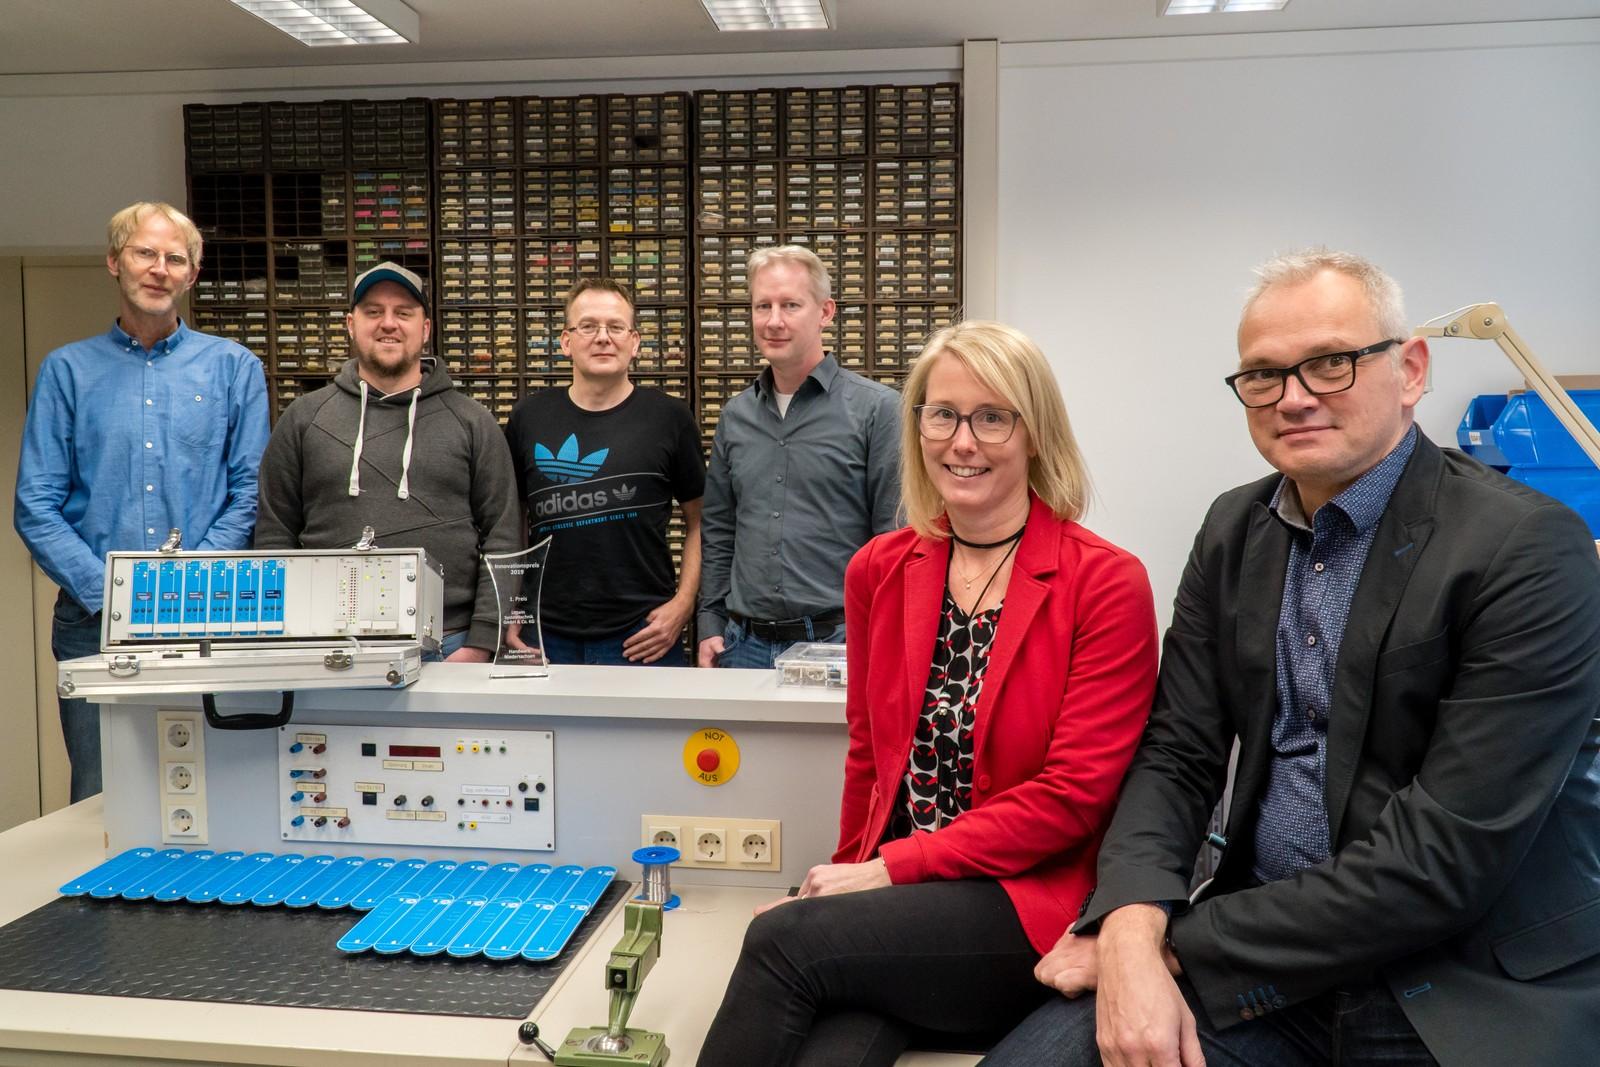 Torsten Janssen, Andreas Tholen, Michael Kersting und Kai Schmidt neben dem Unternehmerpaar Imke und Jörg Littwin.